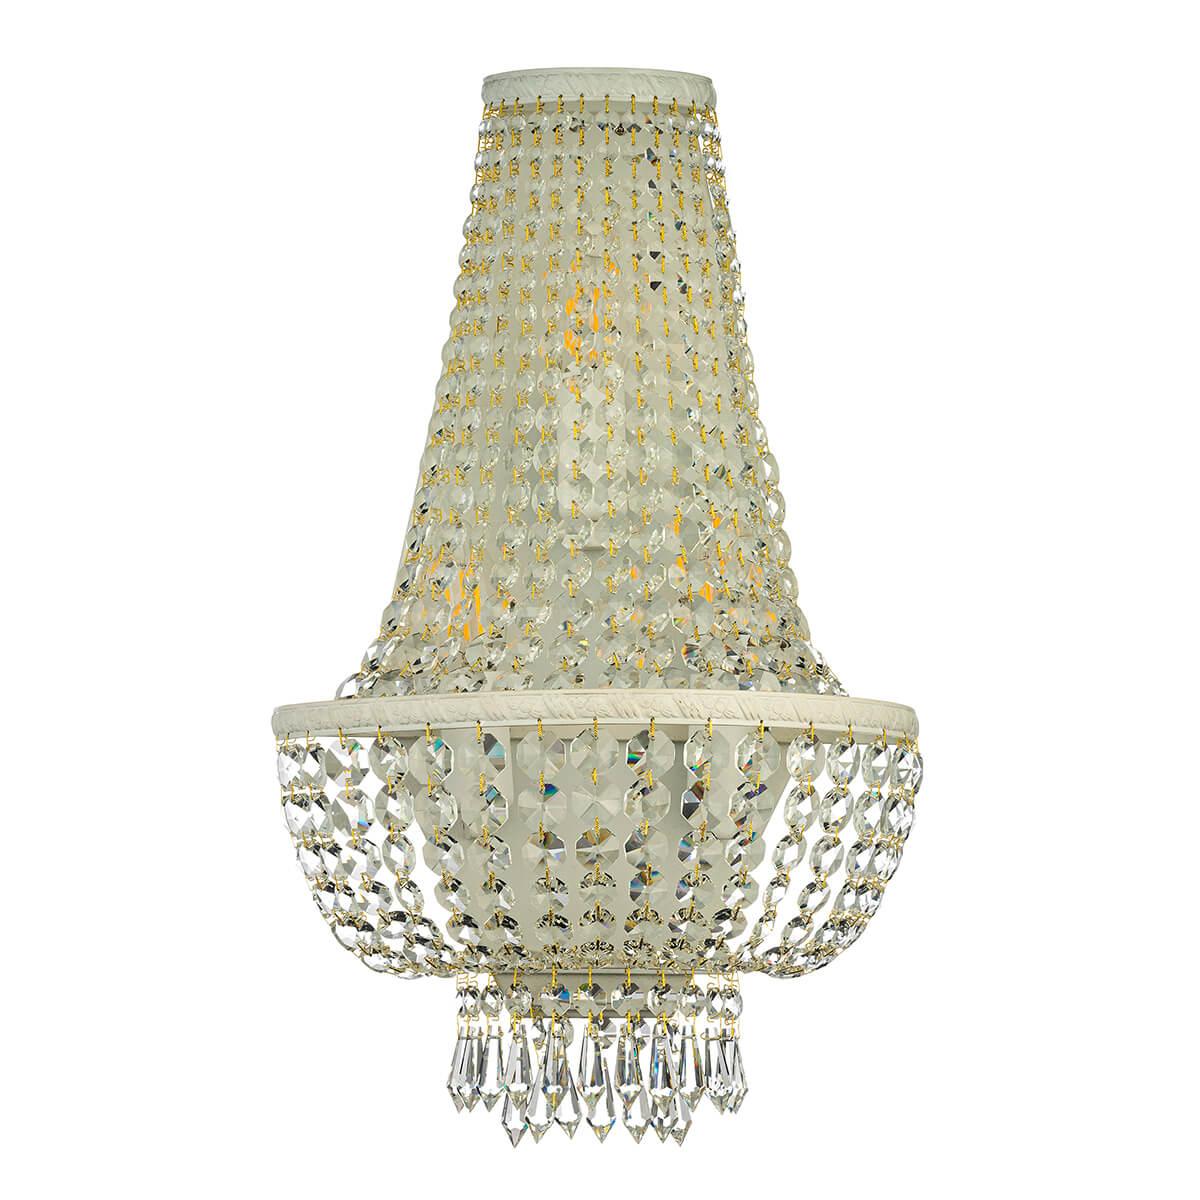 Настенный светильник Arti Lampadari Nobile E 2.20.100 WG